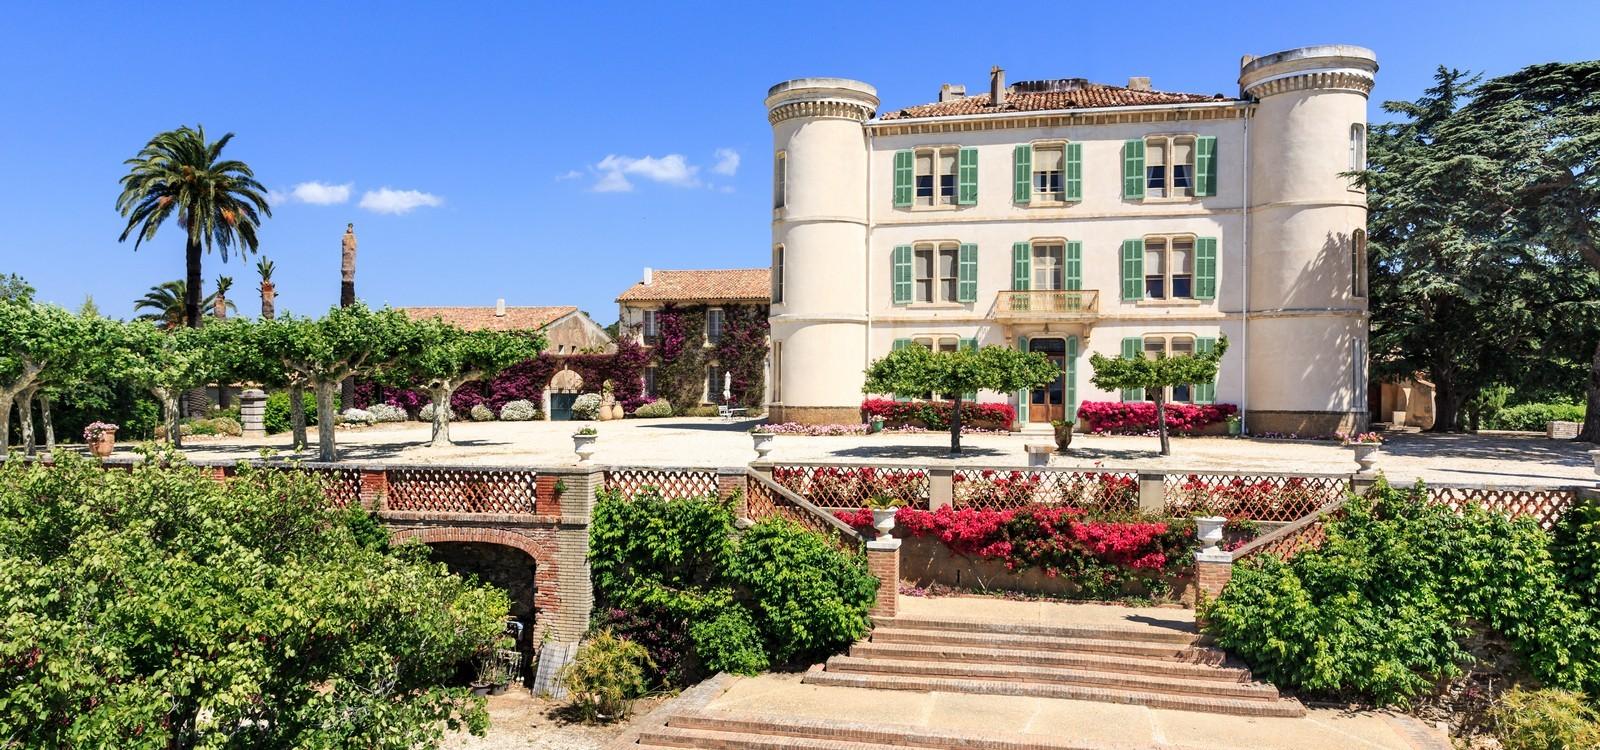 Chateau de Bregancon